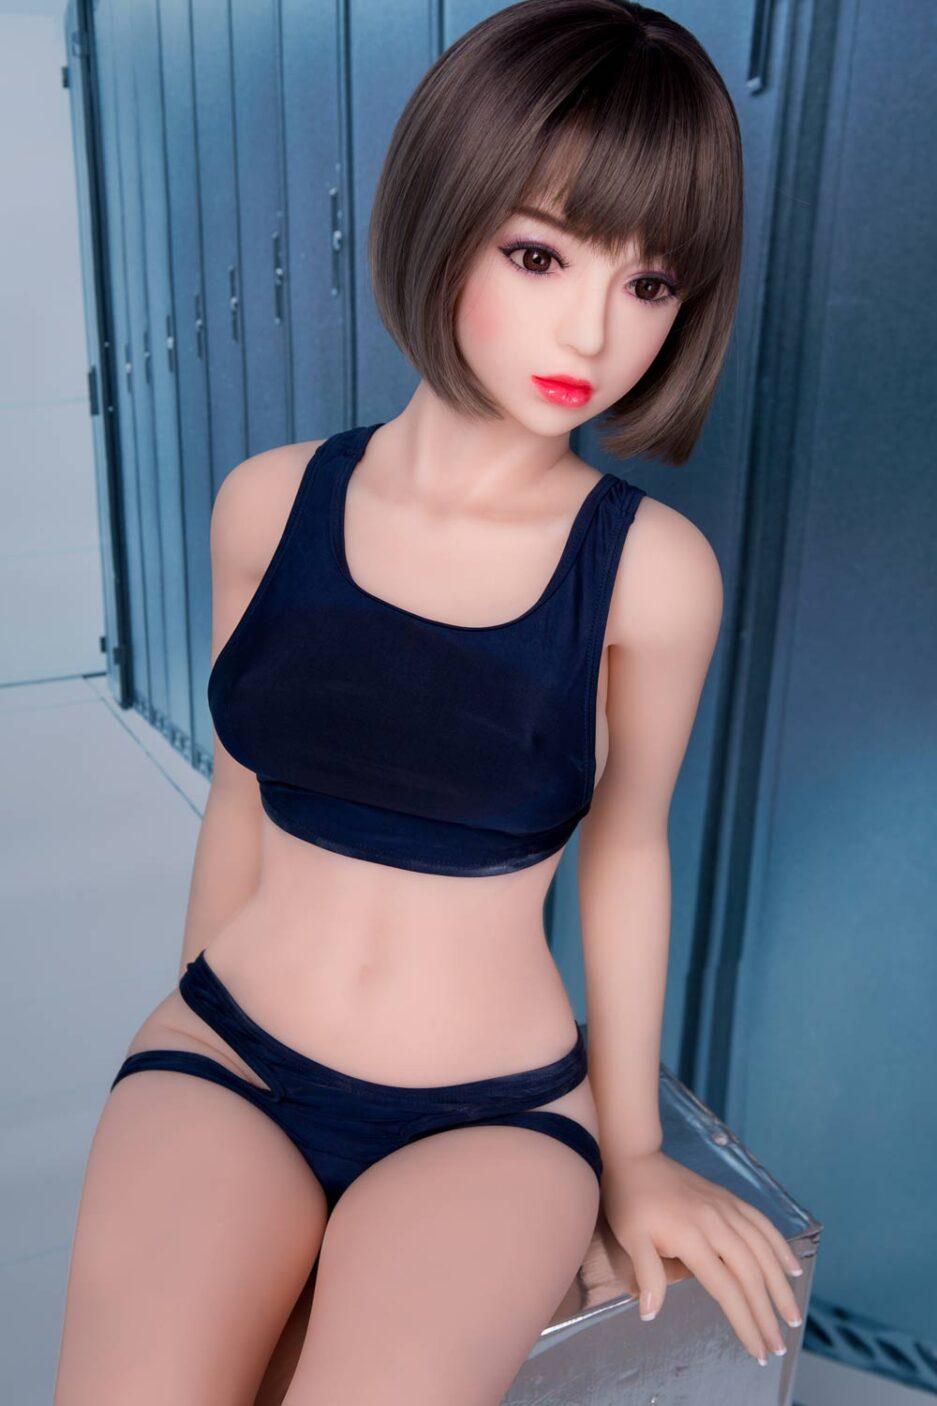 Short Hair Teen Sex Doll